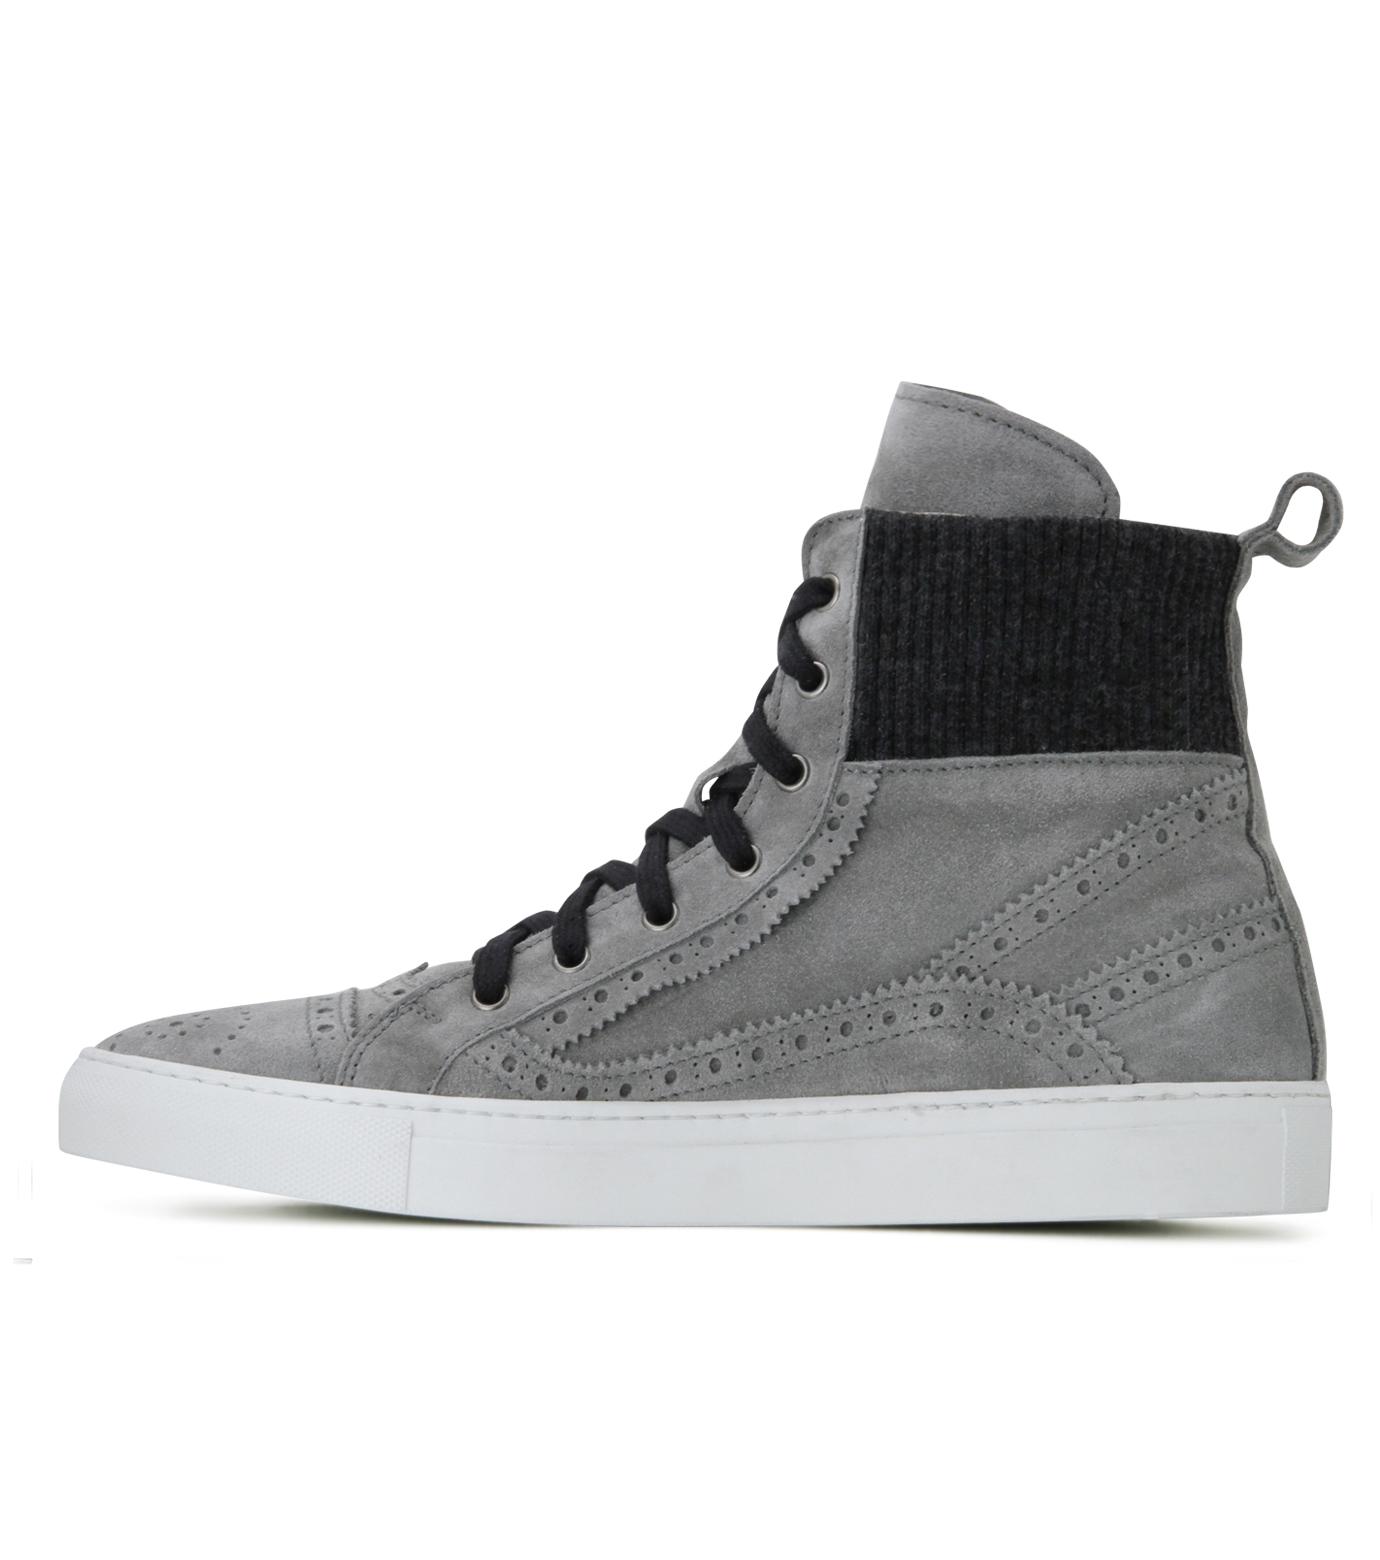 Les Homme(レゾム)のKnit Sneaker-LIGHT GRAY-LH1212-1107 拡大詳細画像3